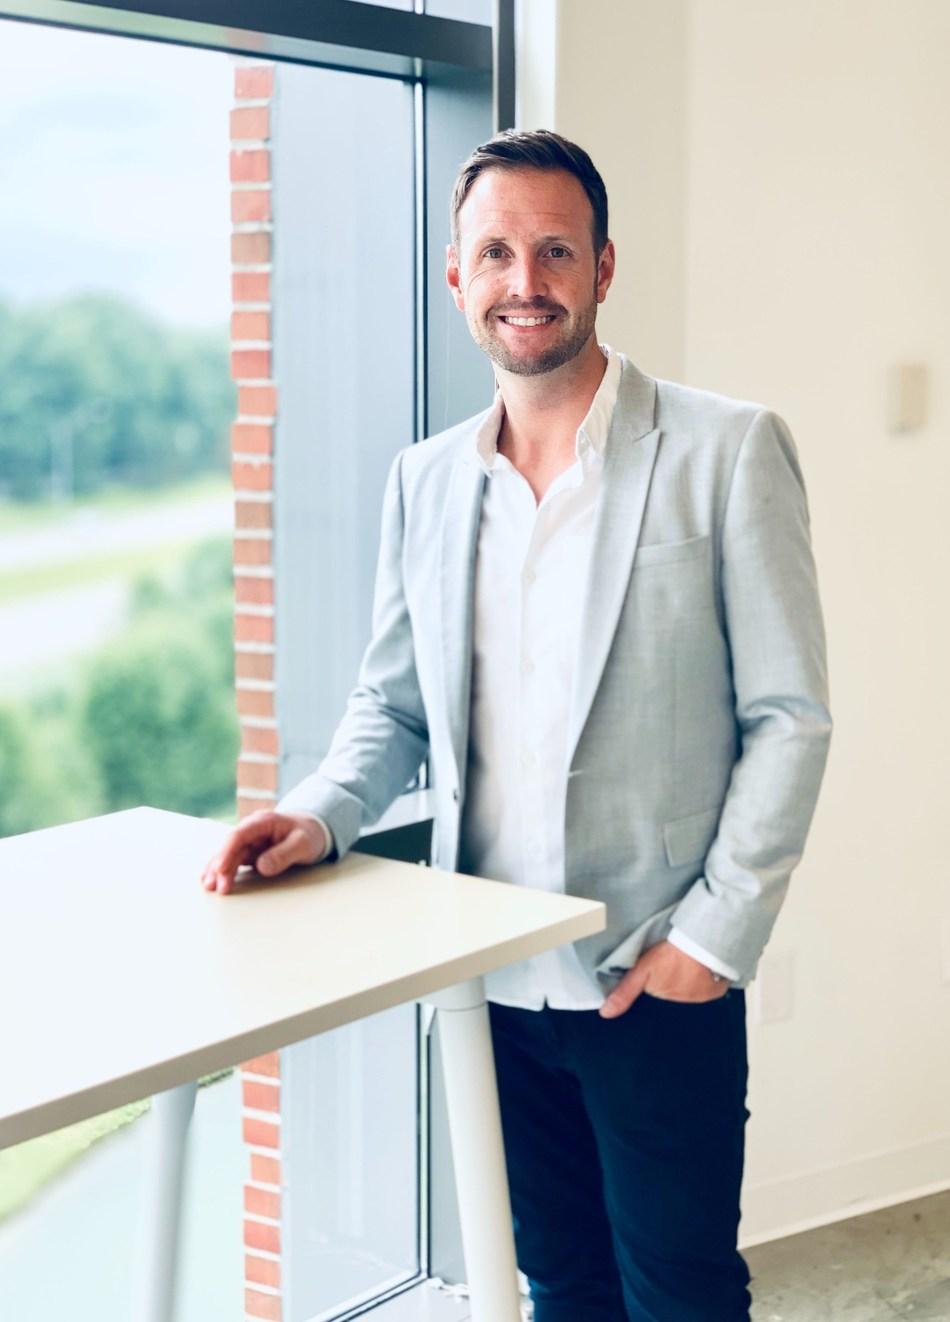 Dan Snyder, CEO of Lower.com